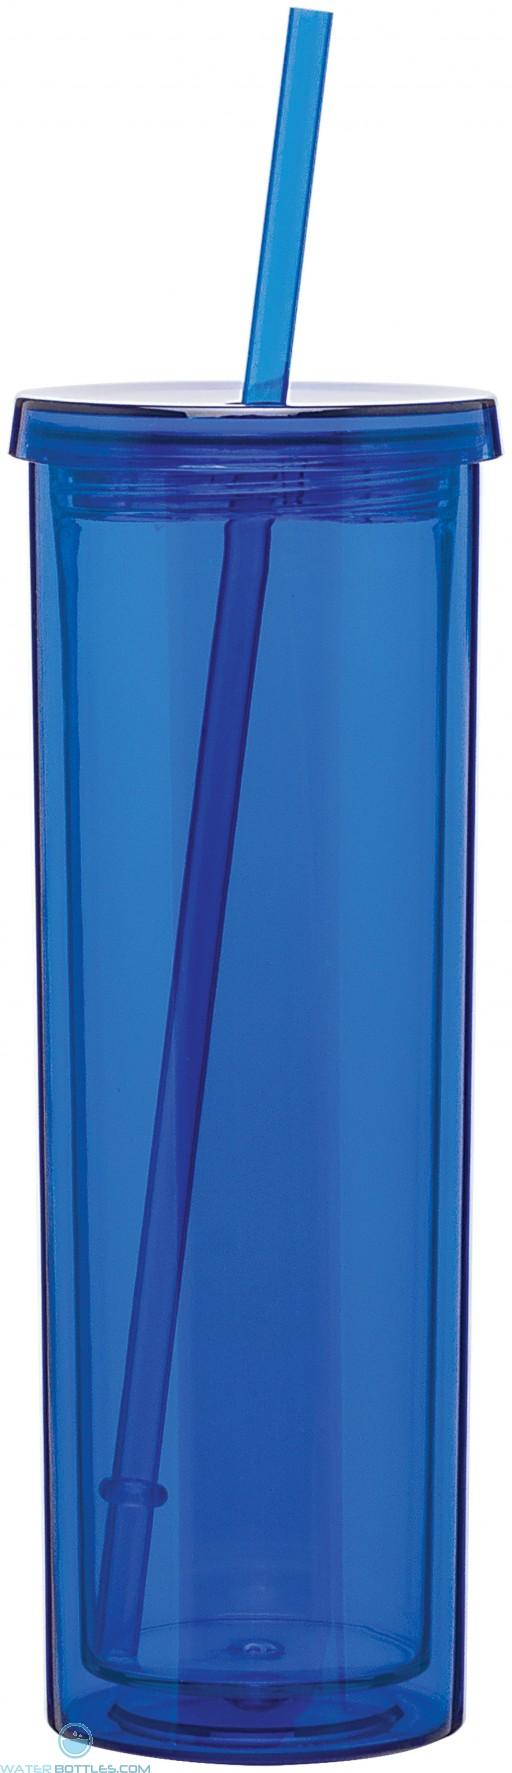 16 oz verano-blue